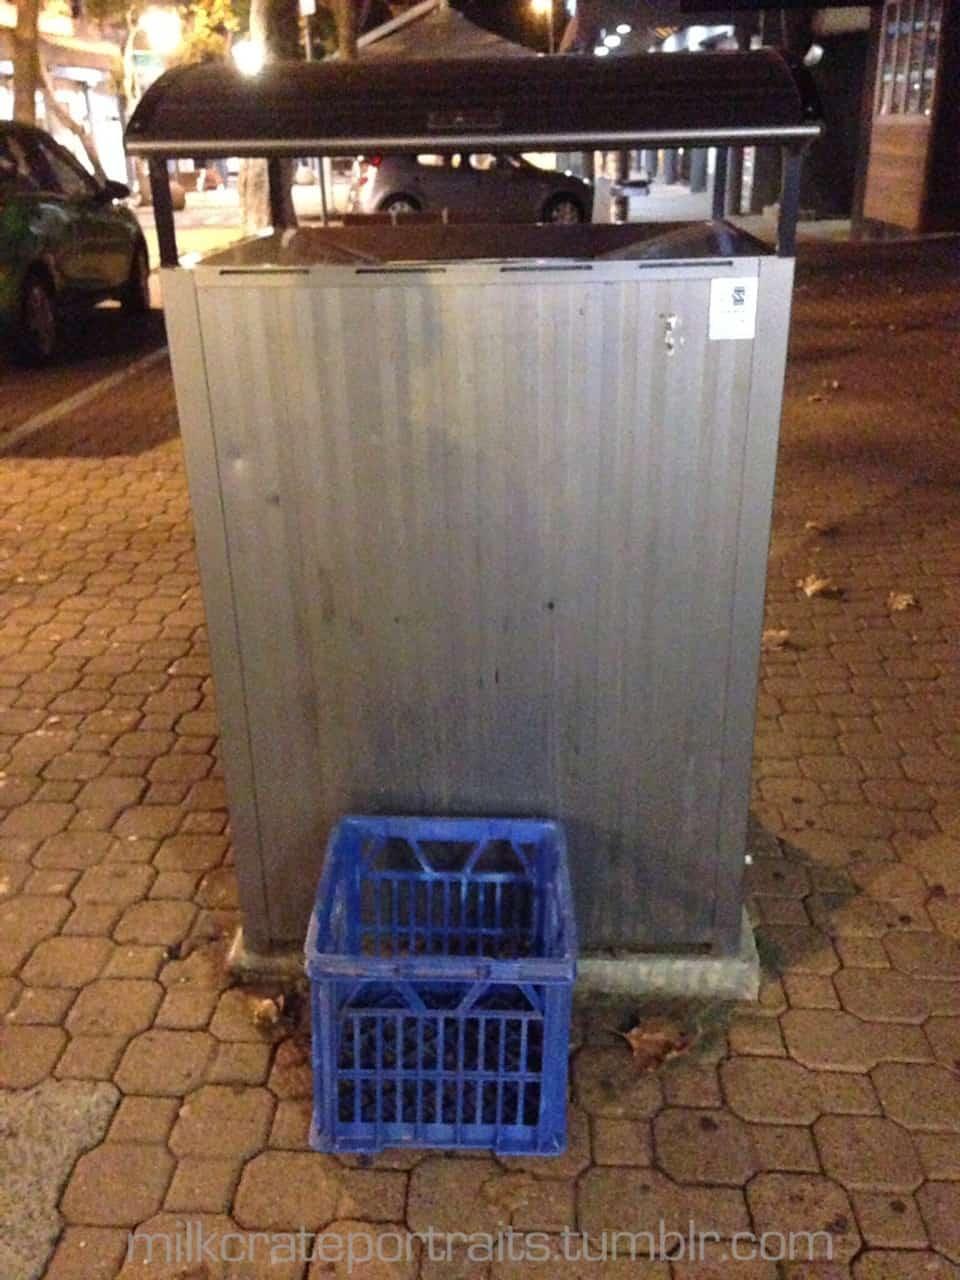 Newcastle milk crate